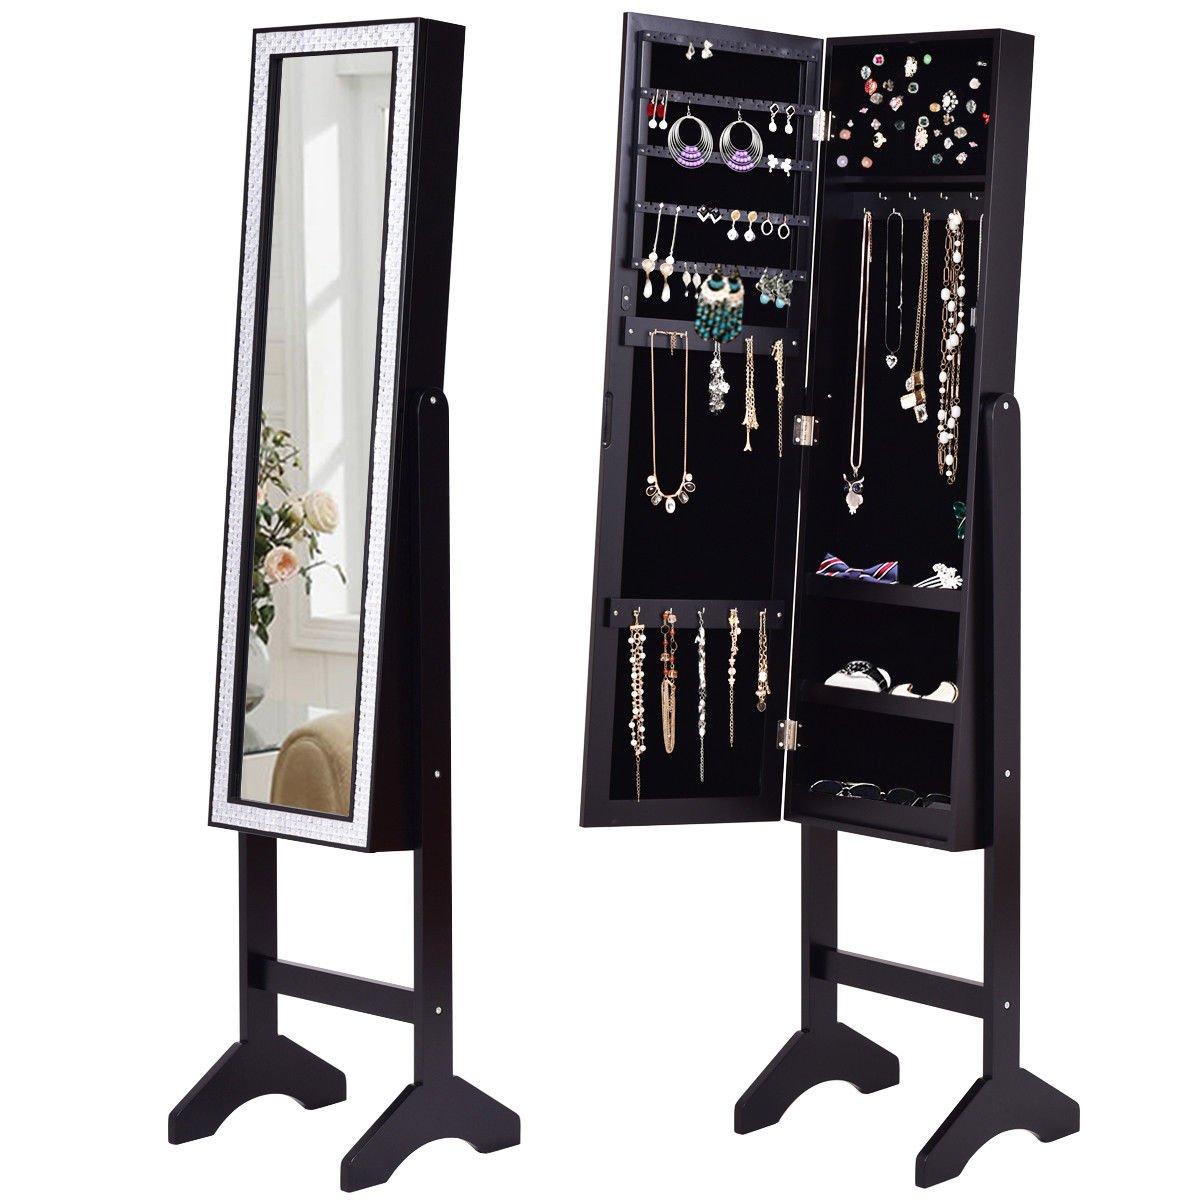 Giantex Mirrored Jewelry Cabinet Armoire with Mirror w/Resin Diamond Design Standing Storage Organizer Box, Black